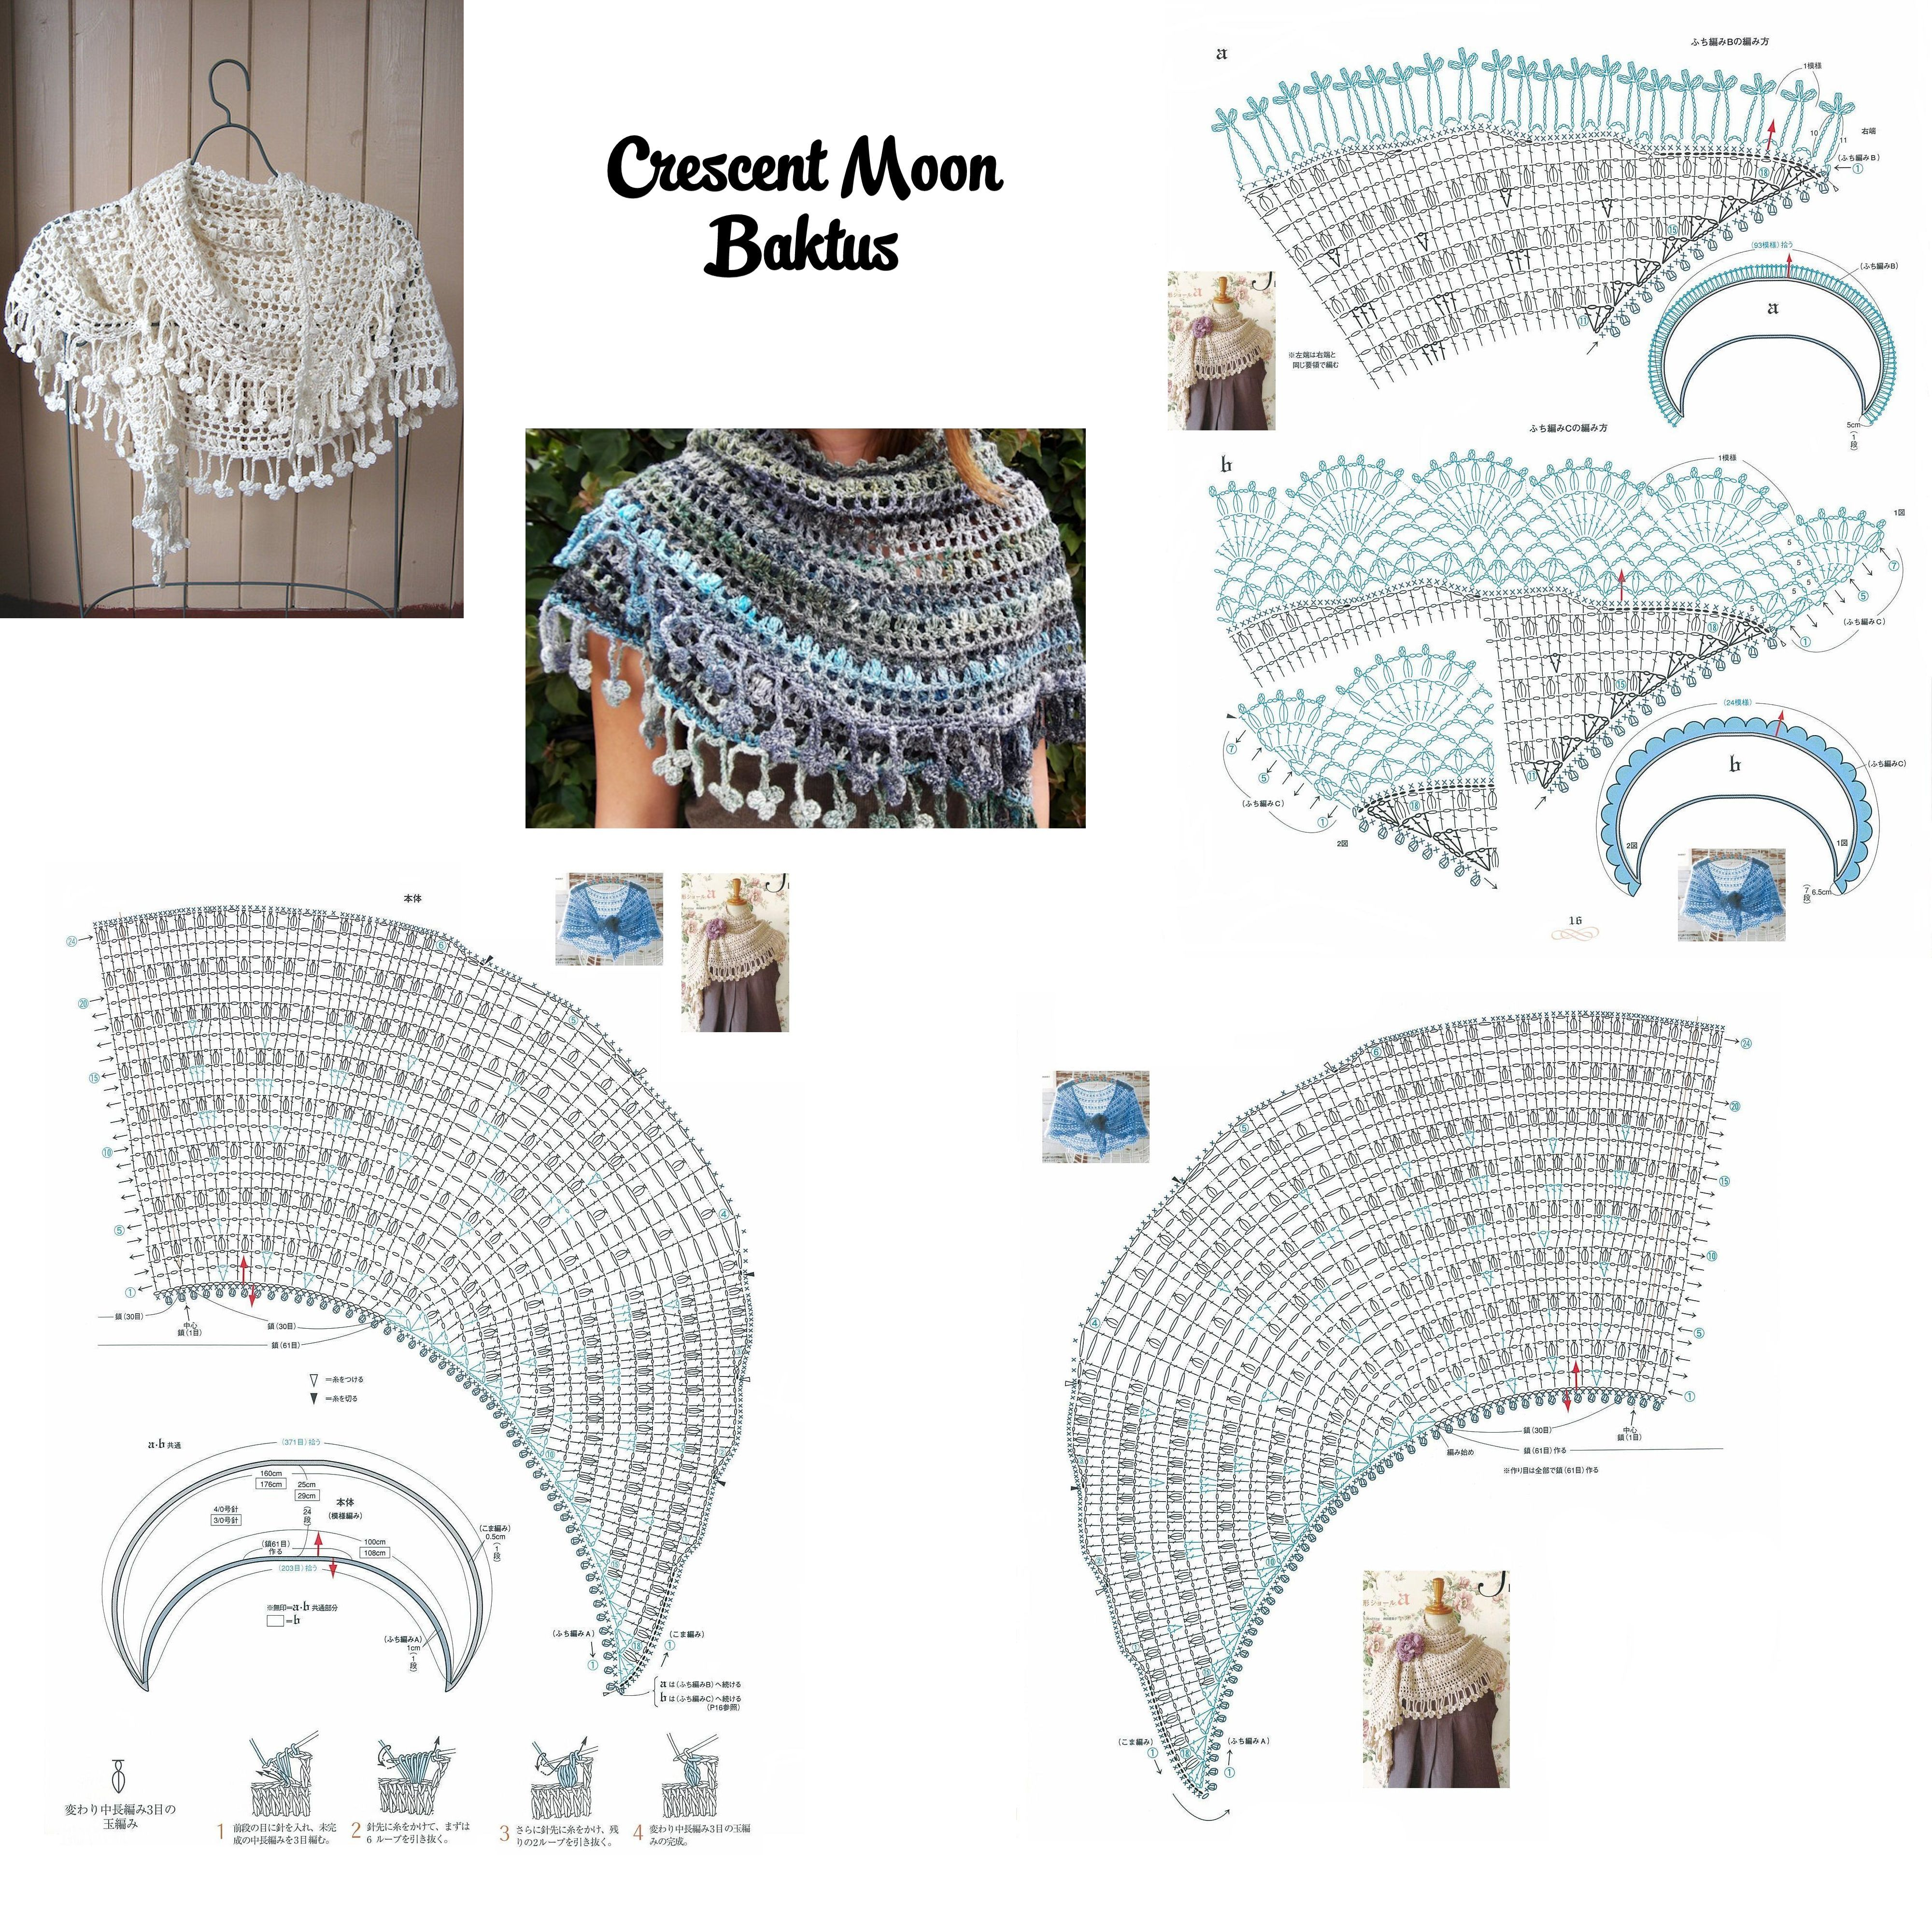 Crochet Crescent Moon Baktus | punto y ganchillo | Pinterest | Chal ...